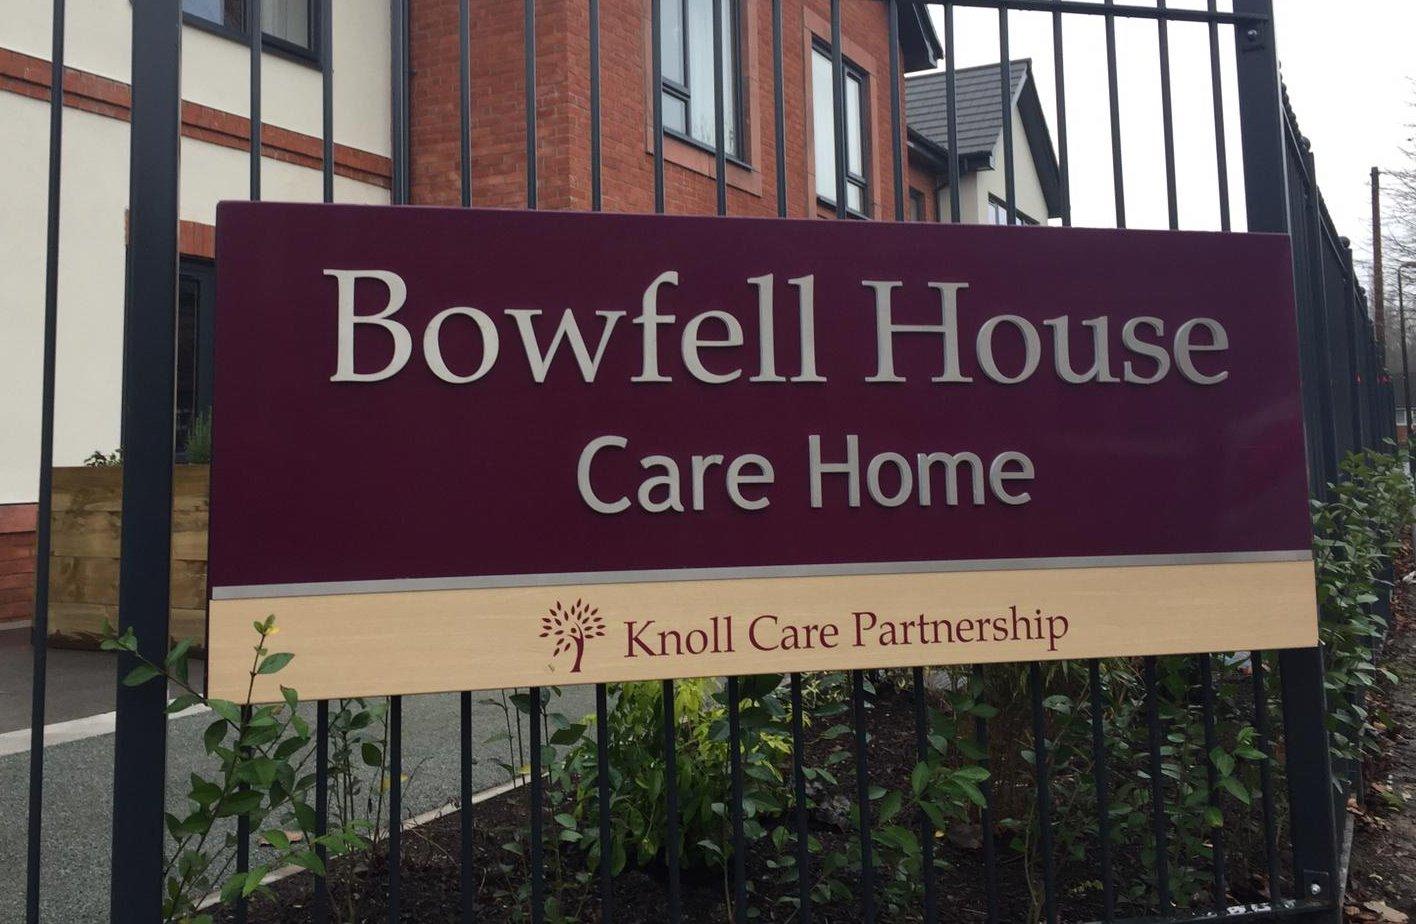 Knoll Care Partnership